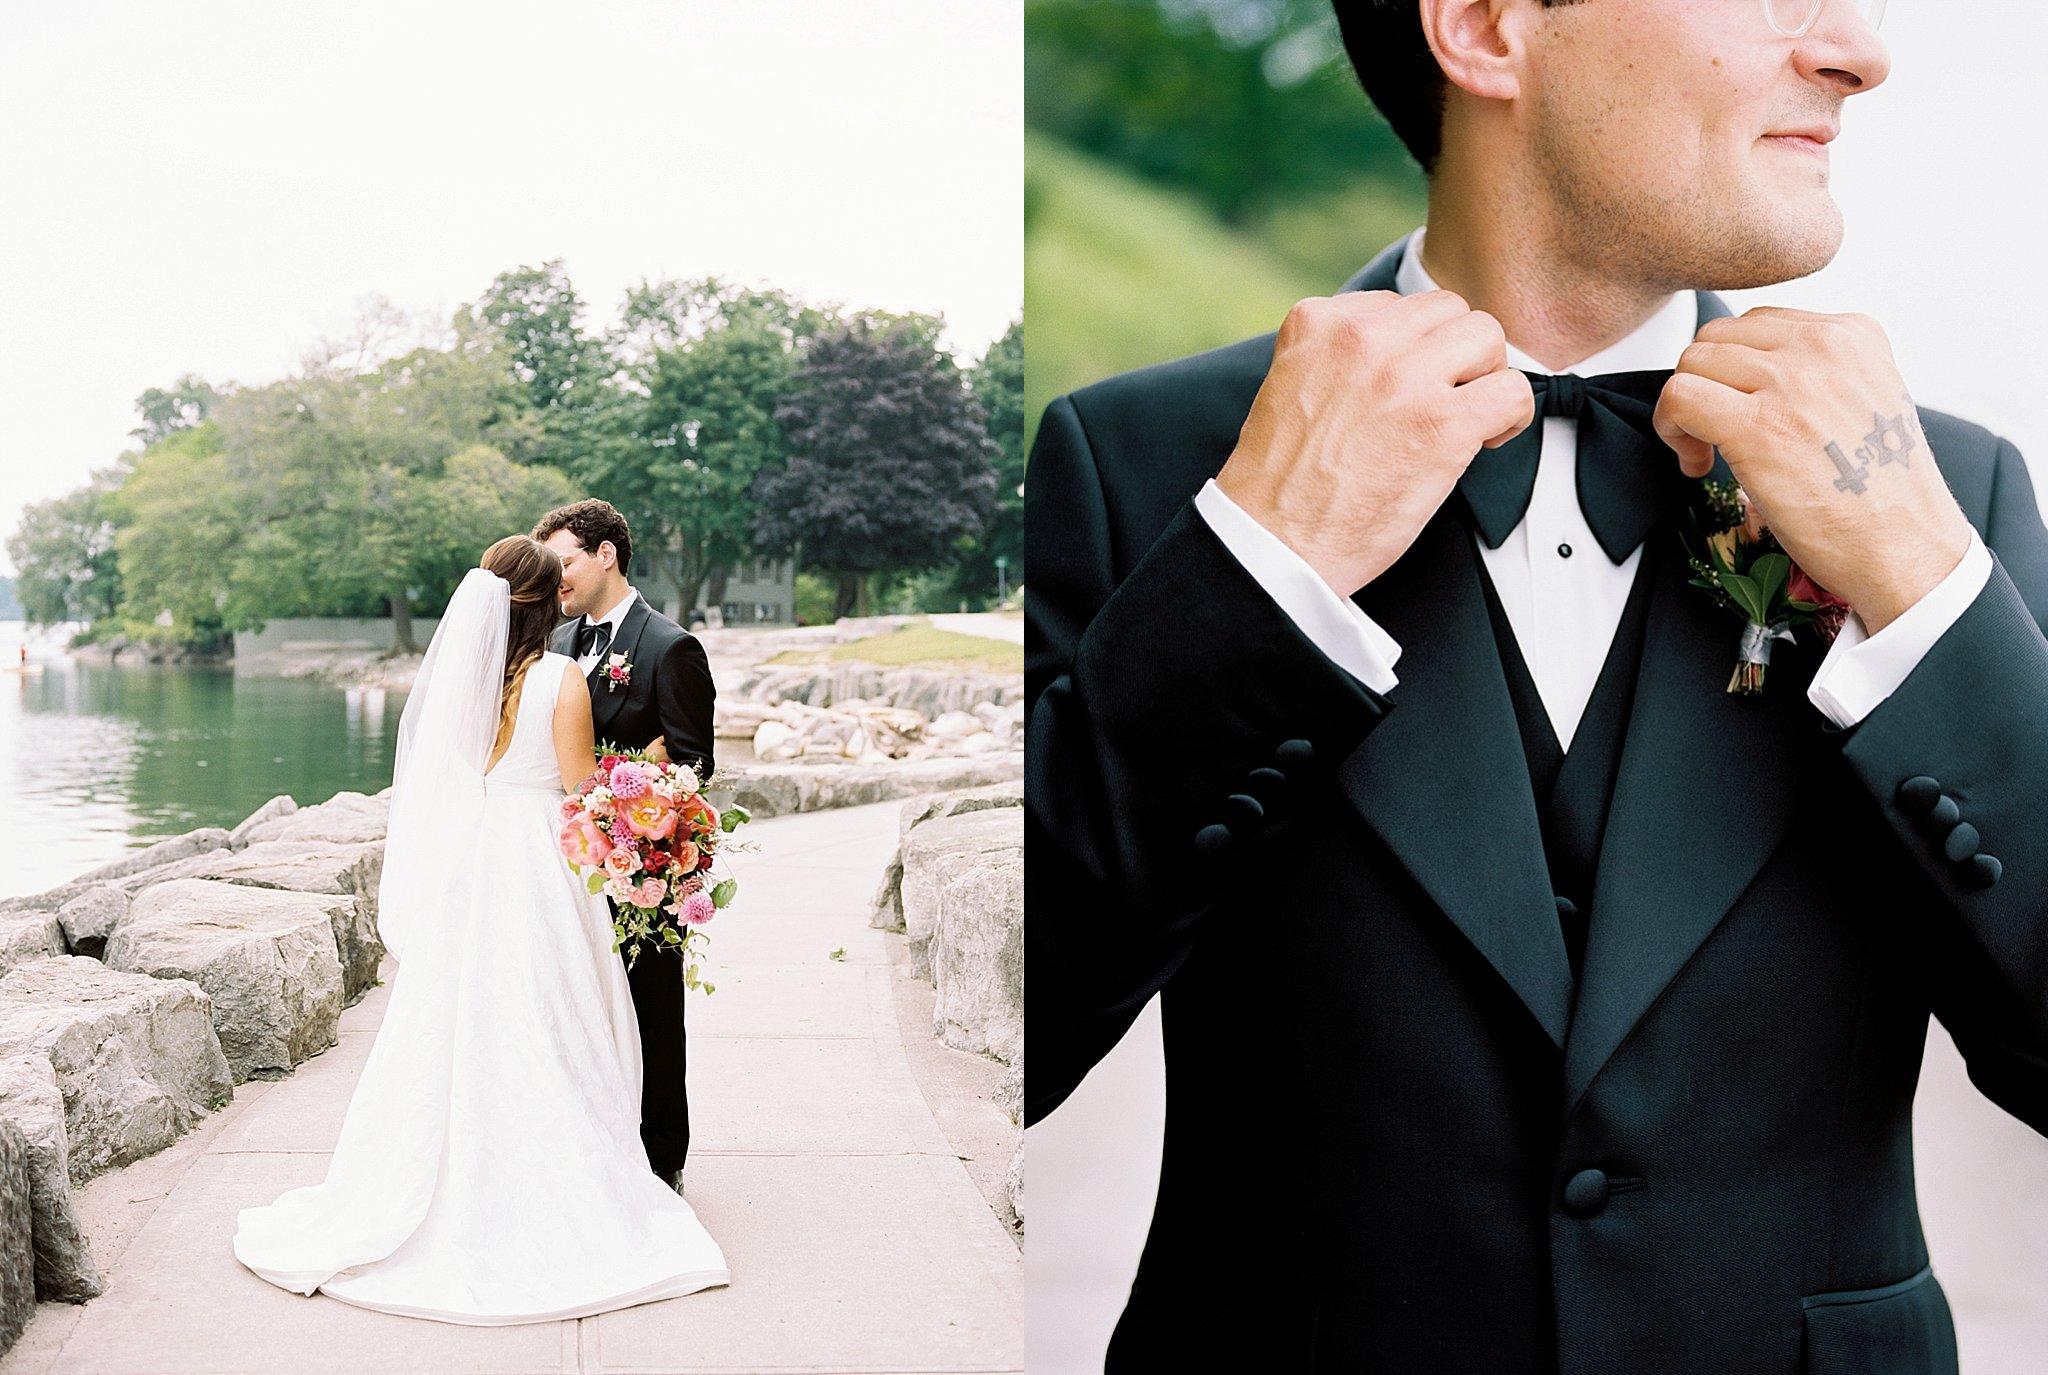 Toronto Wedding Photography, Toronto film photographer, Durham Region Wedding Photography